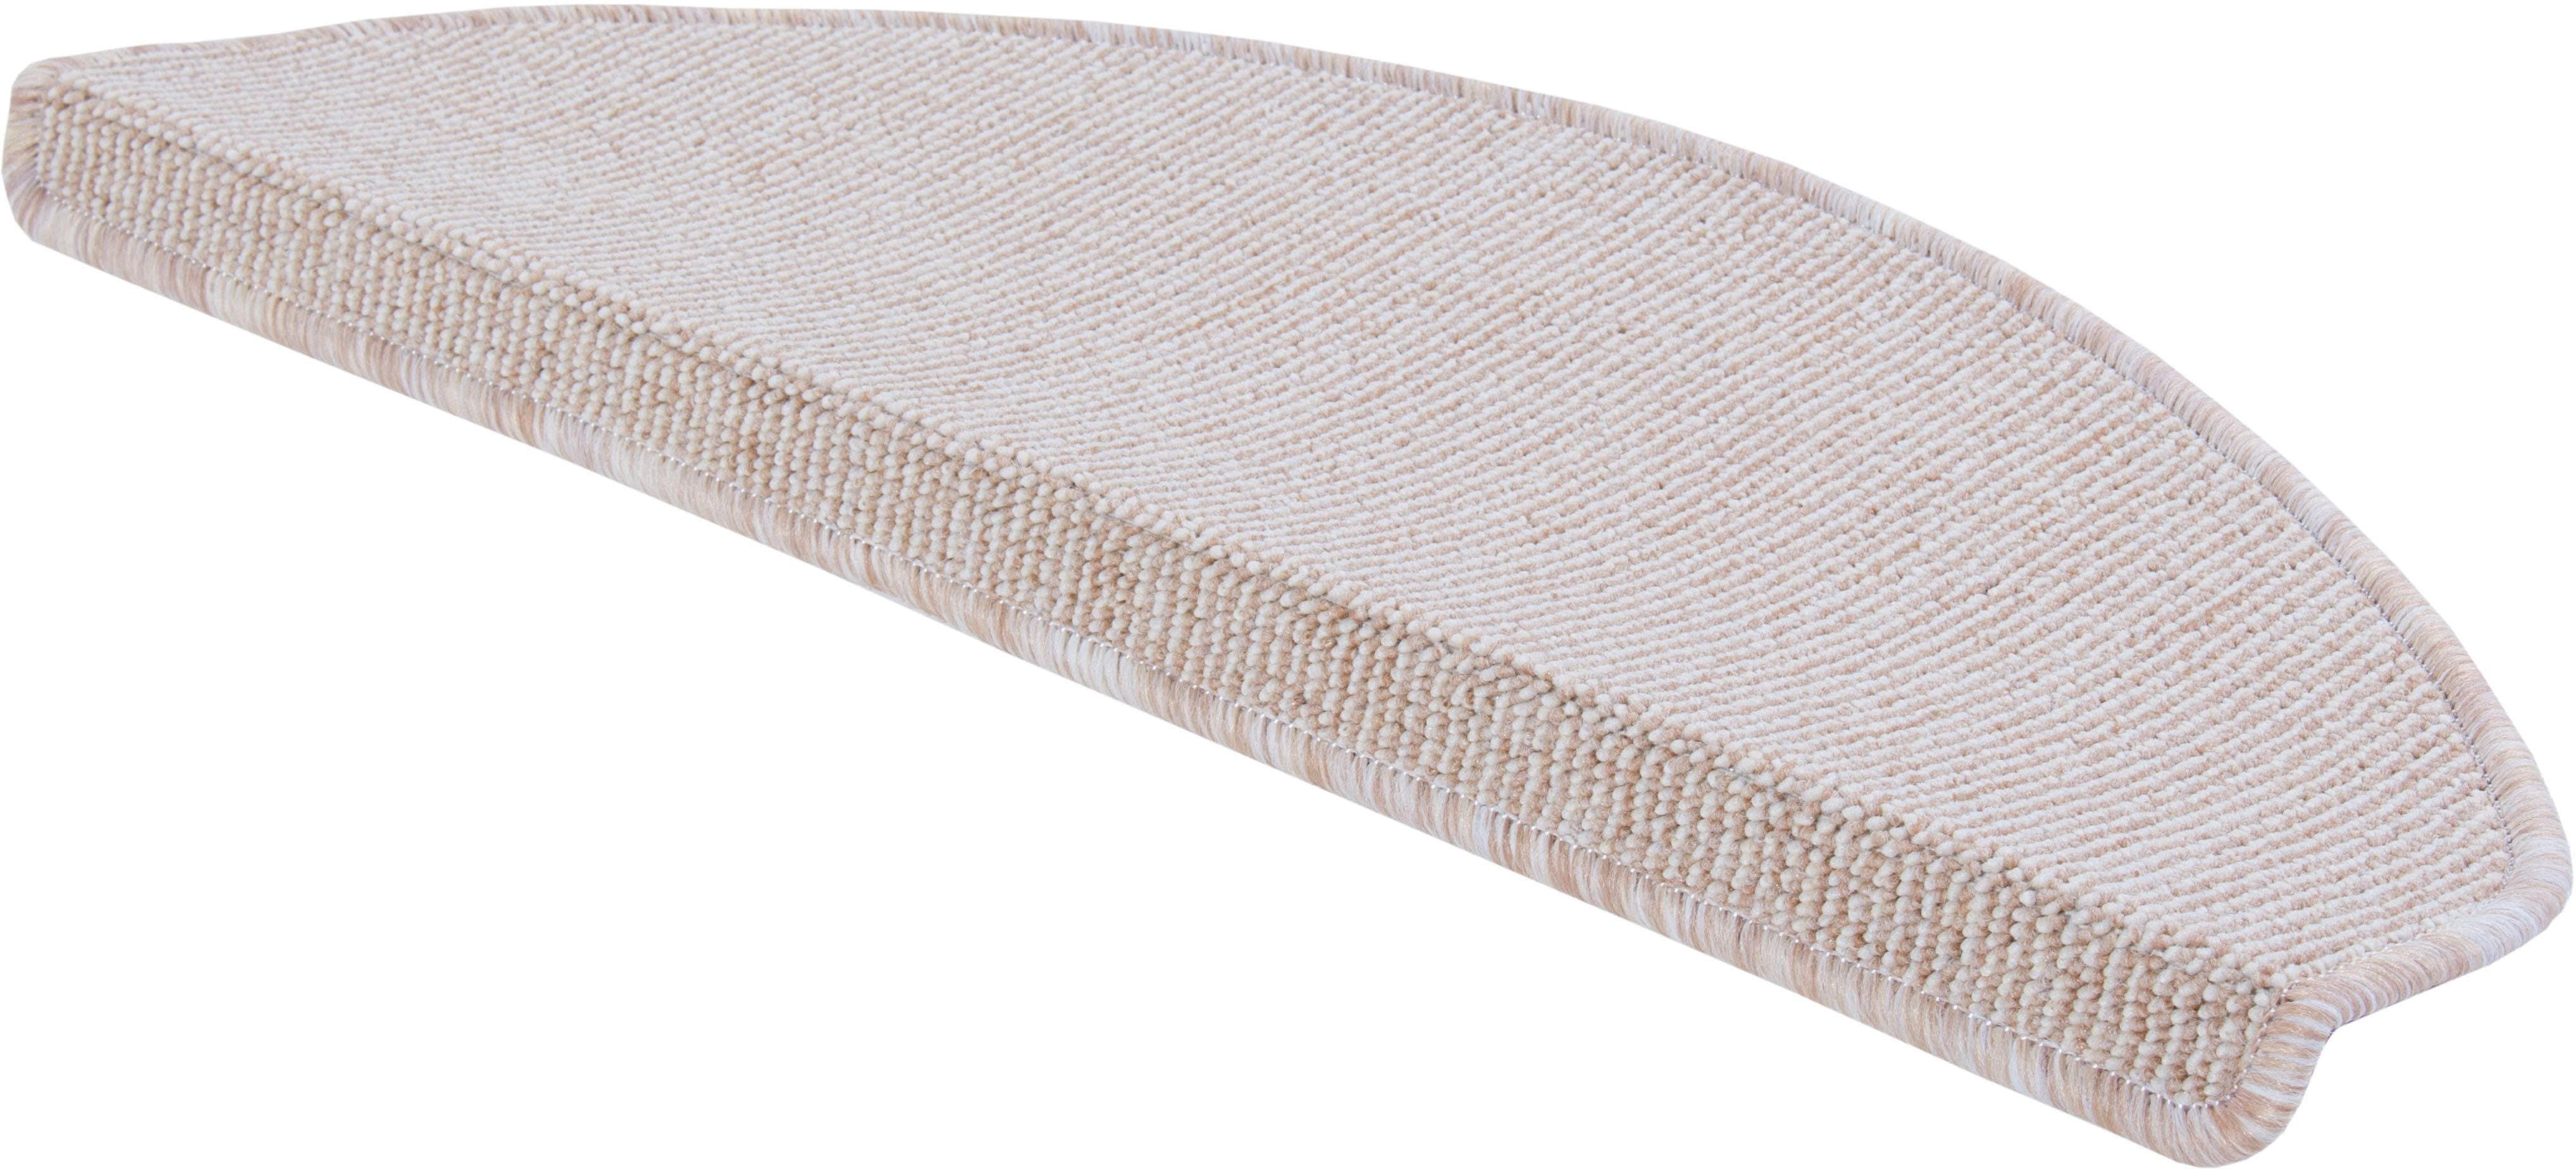 Stufenmatte Ben Andiamo stufenförmig Höhe 4 5 mm maschinell gewebt